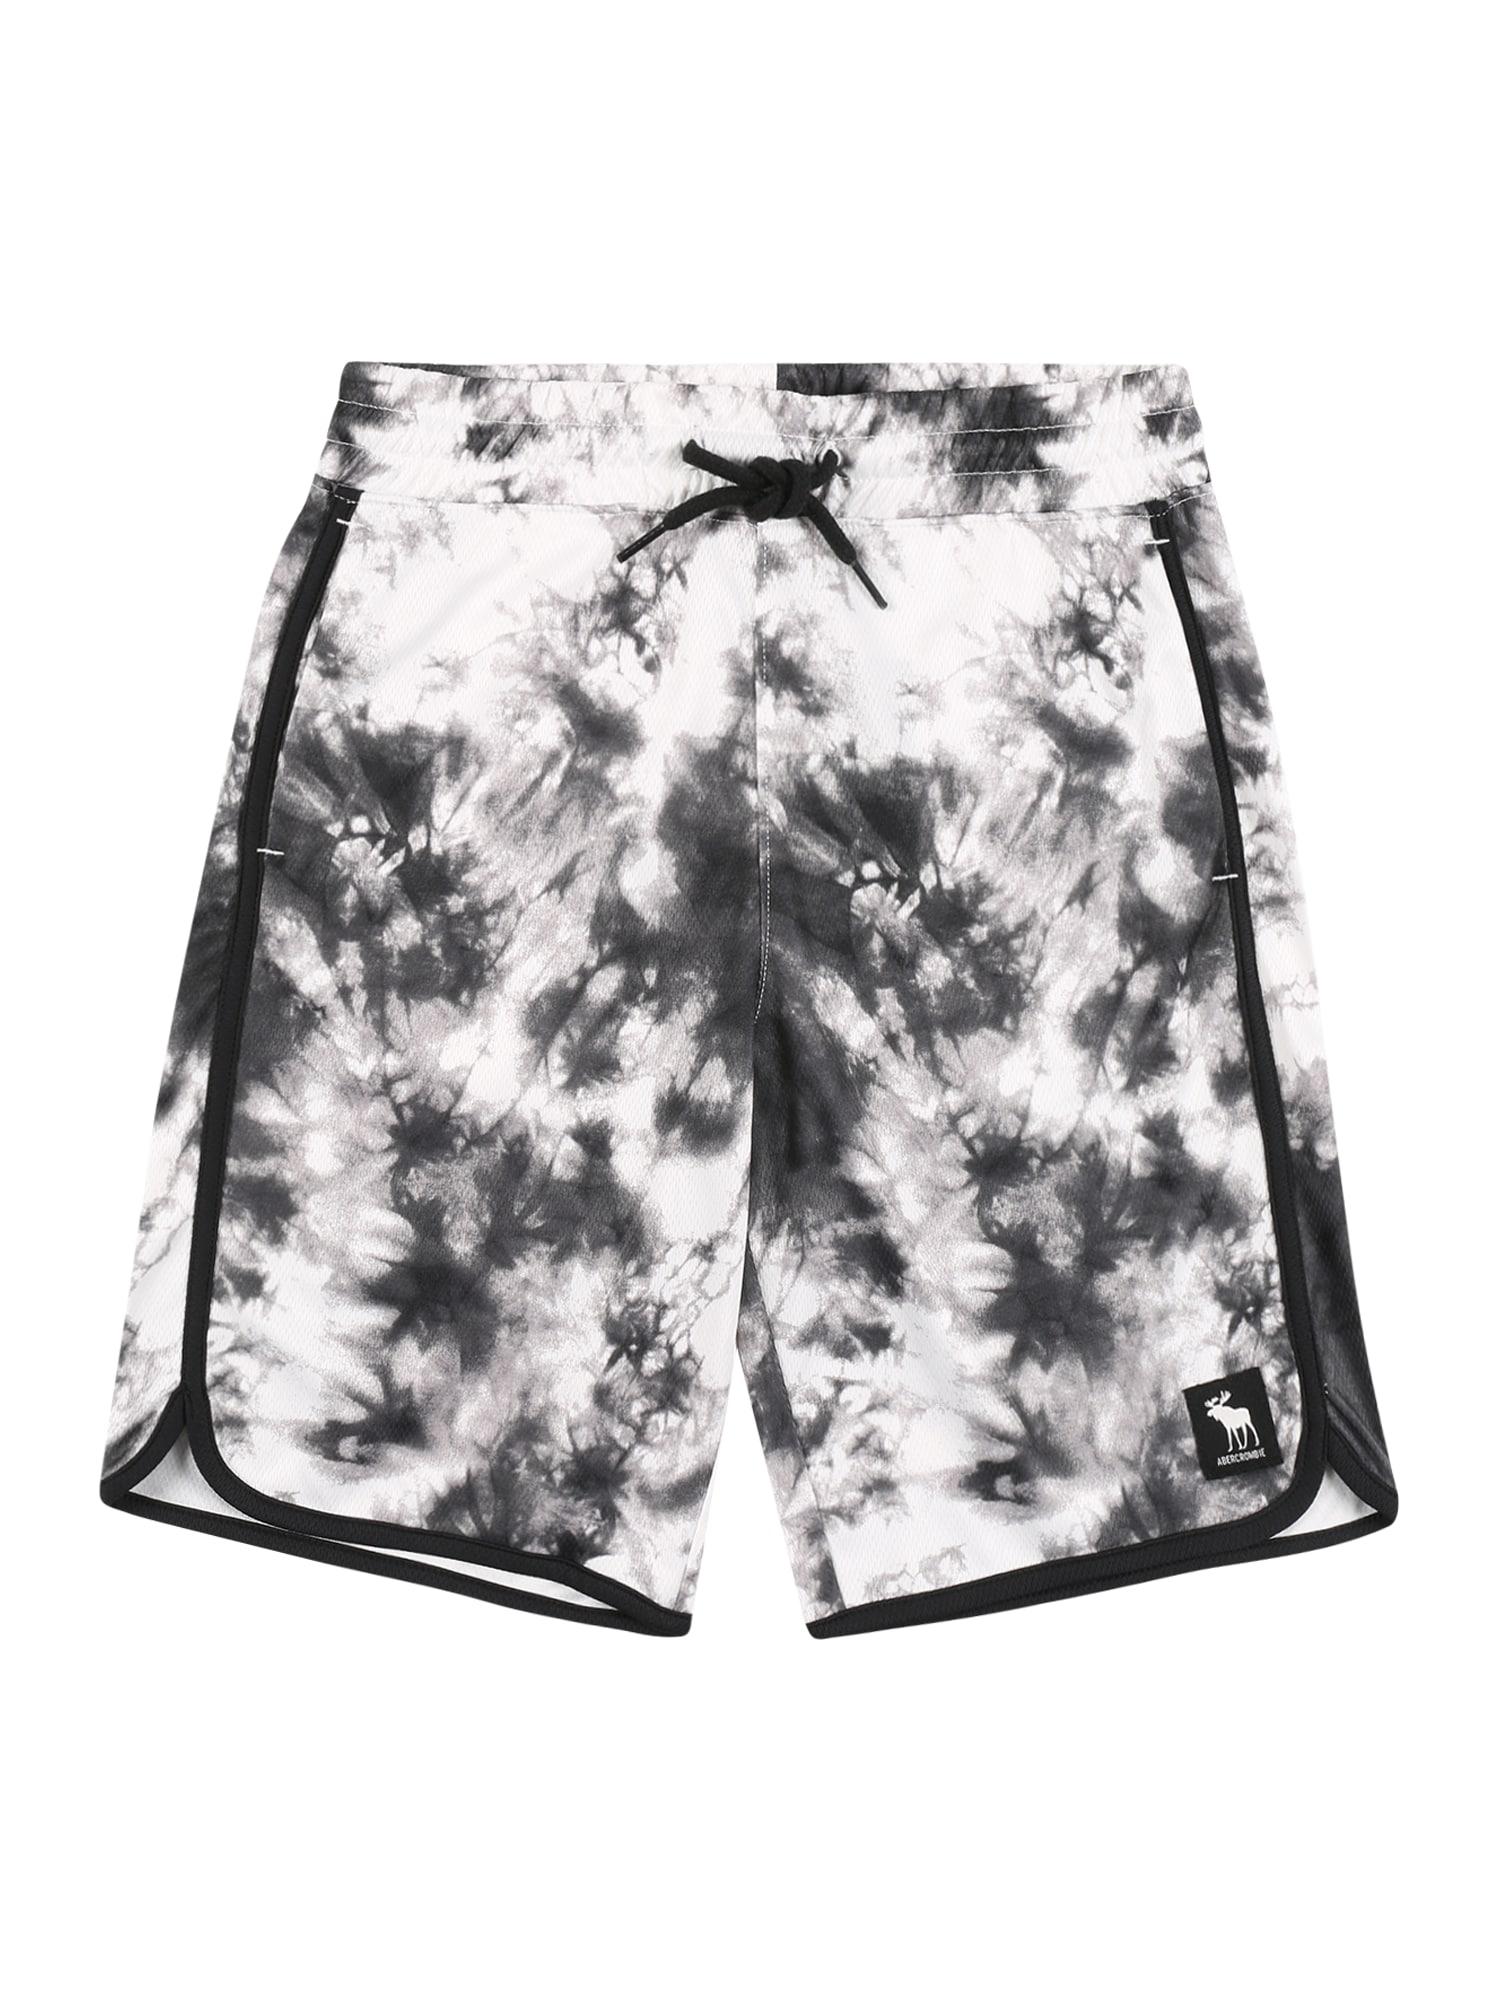 Abercrombie & Fitch Kelnės 'SPRING' juoda / balta